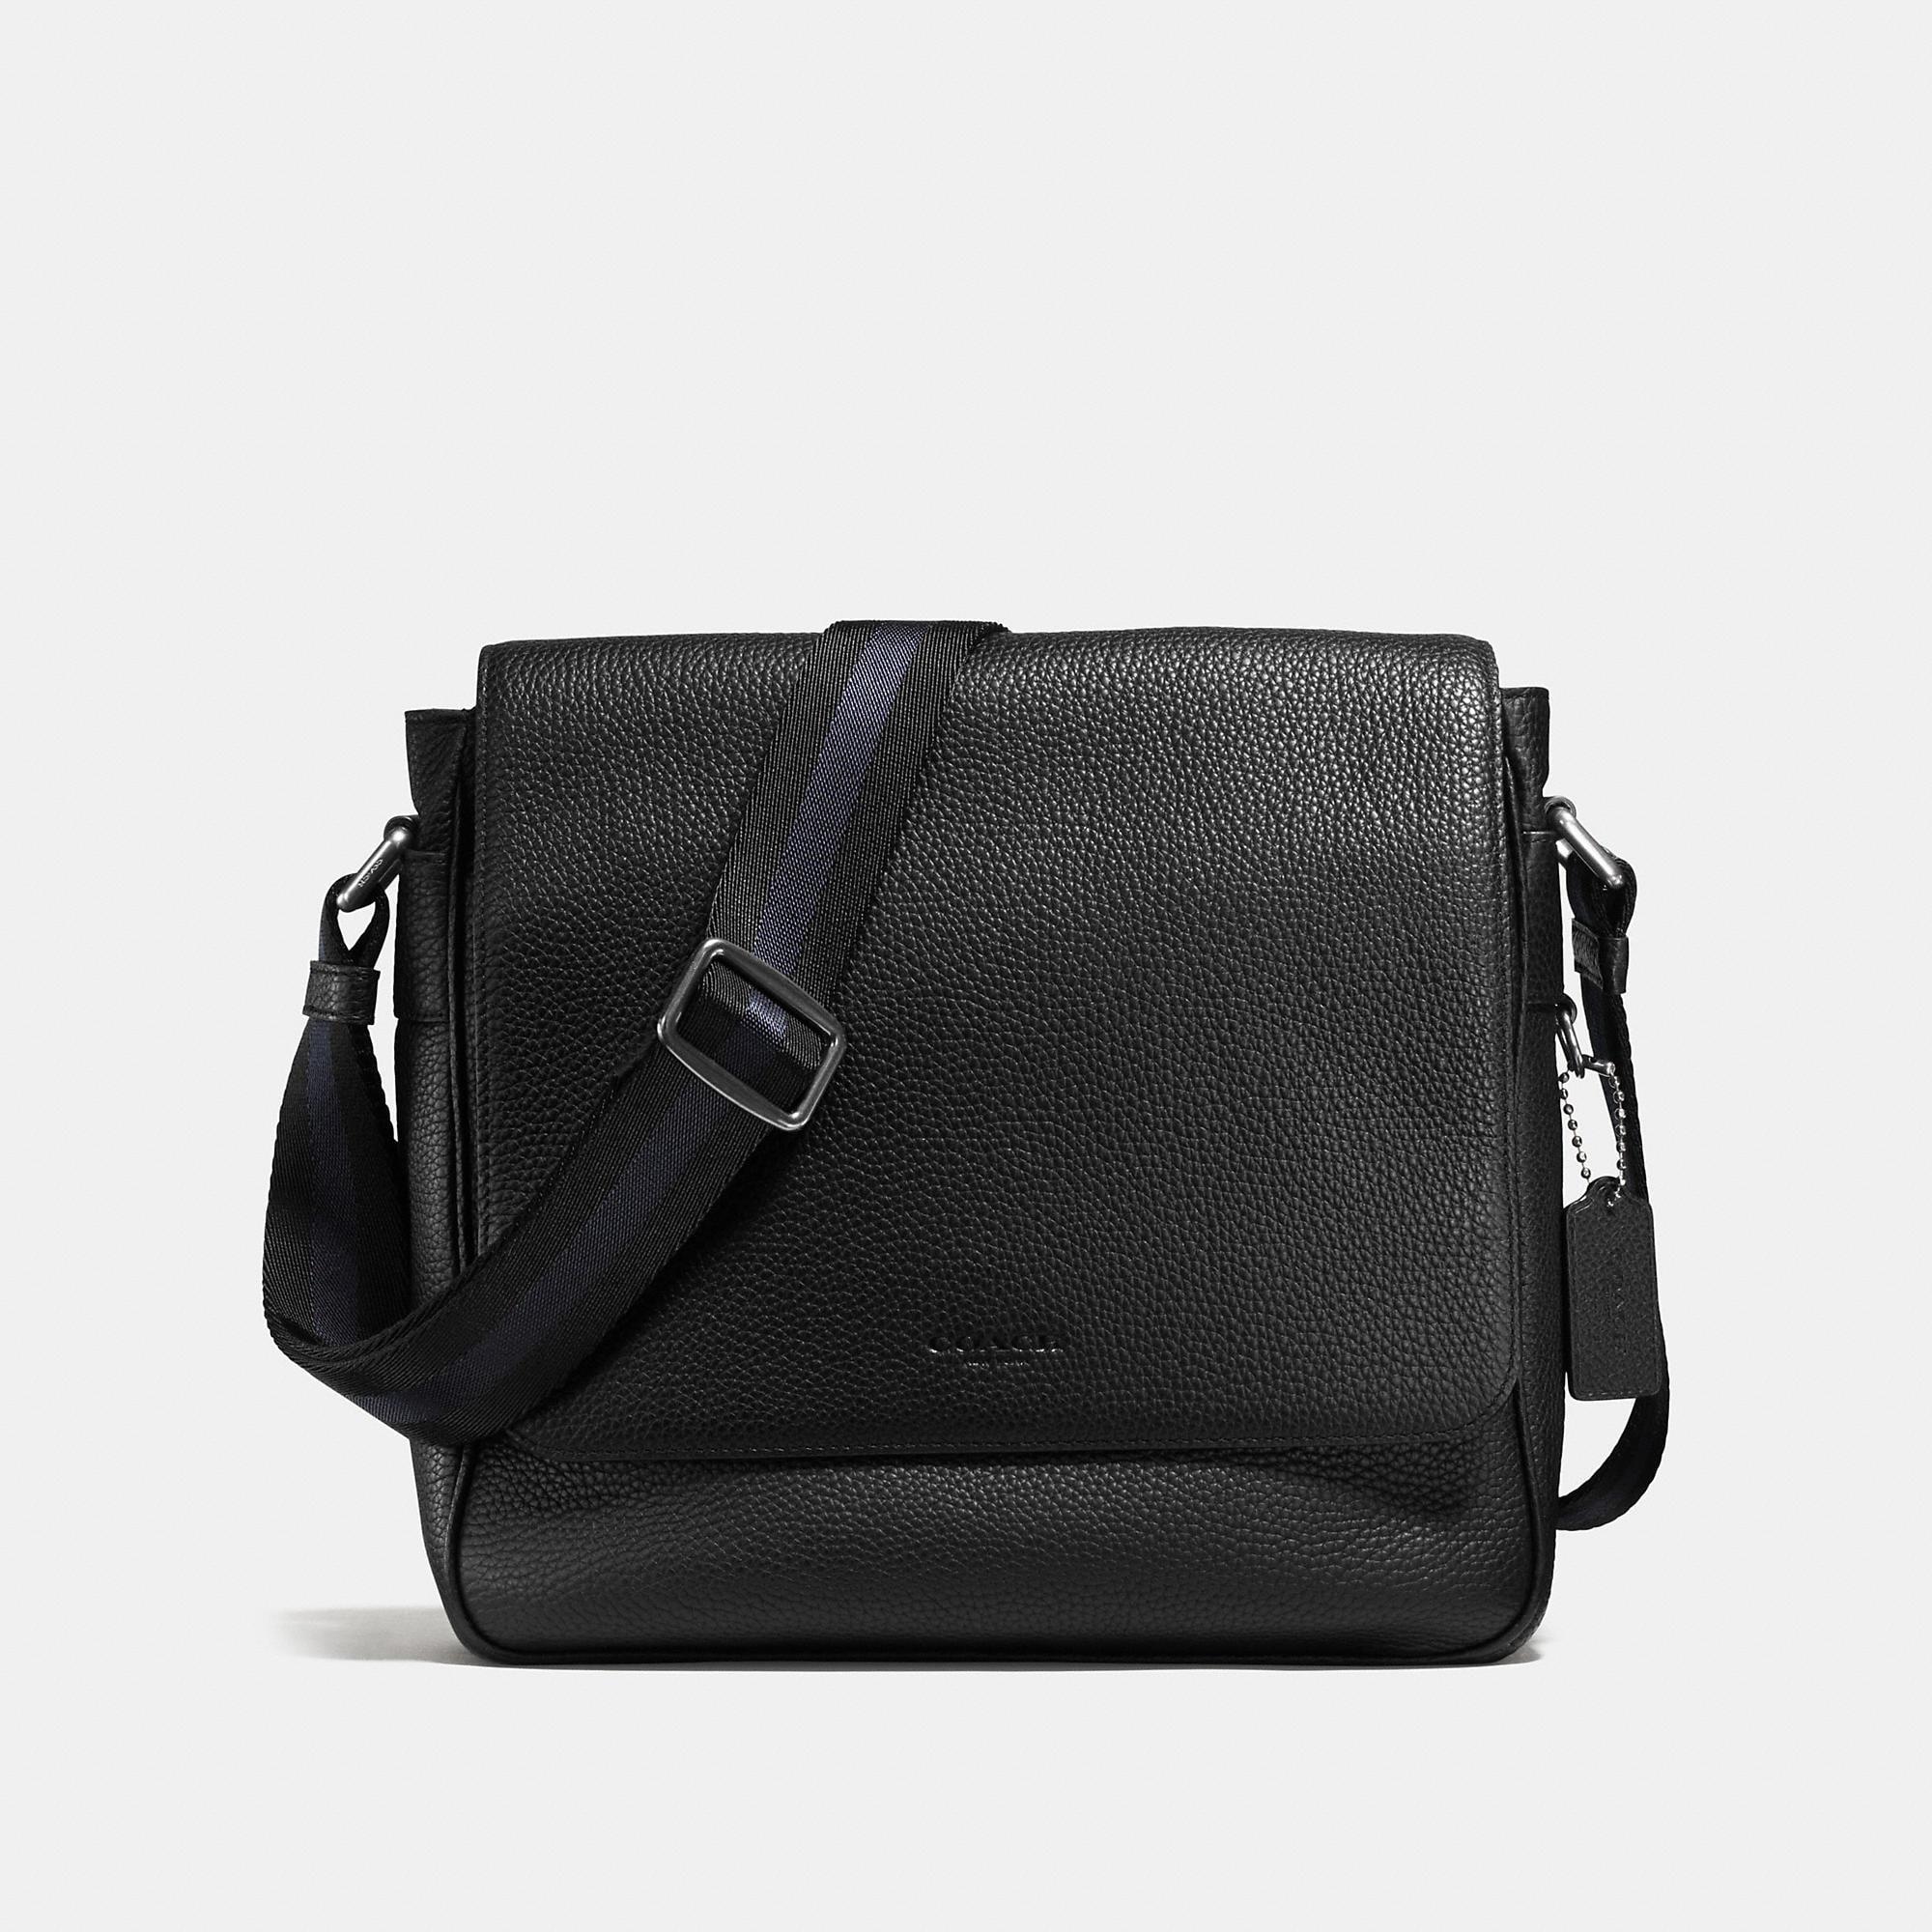 Coach Metropolitan Map Bag In Pebble Leather